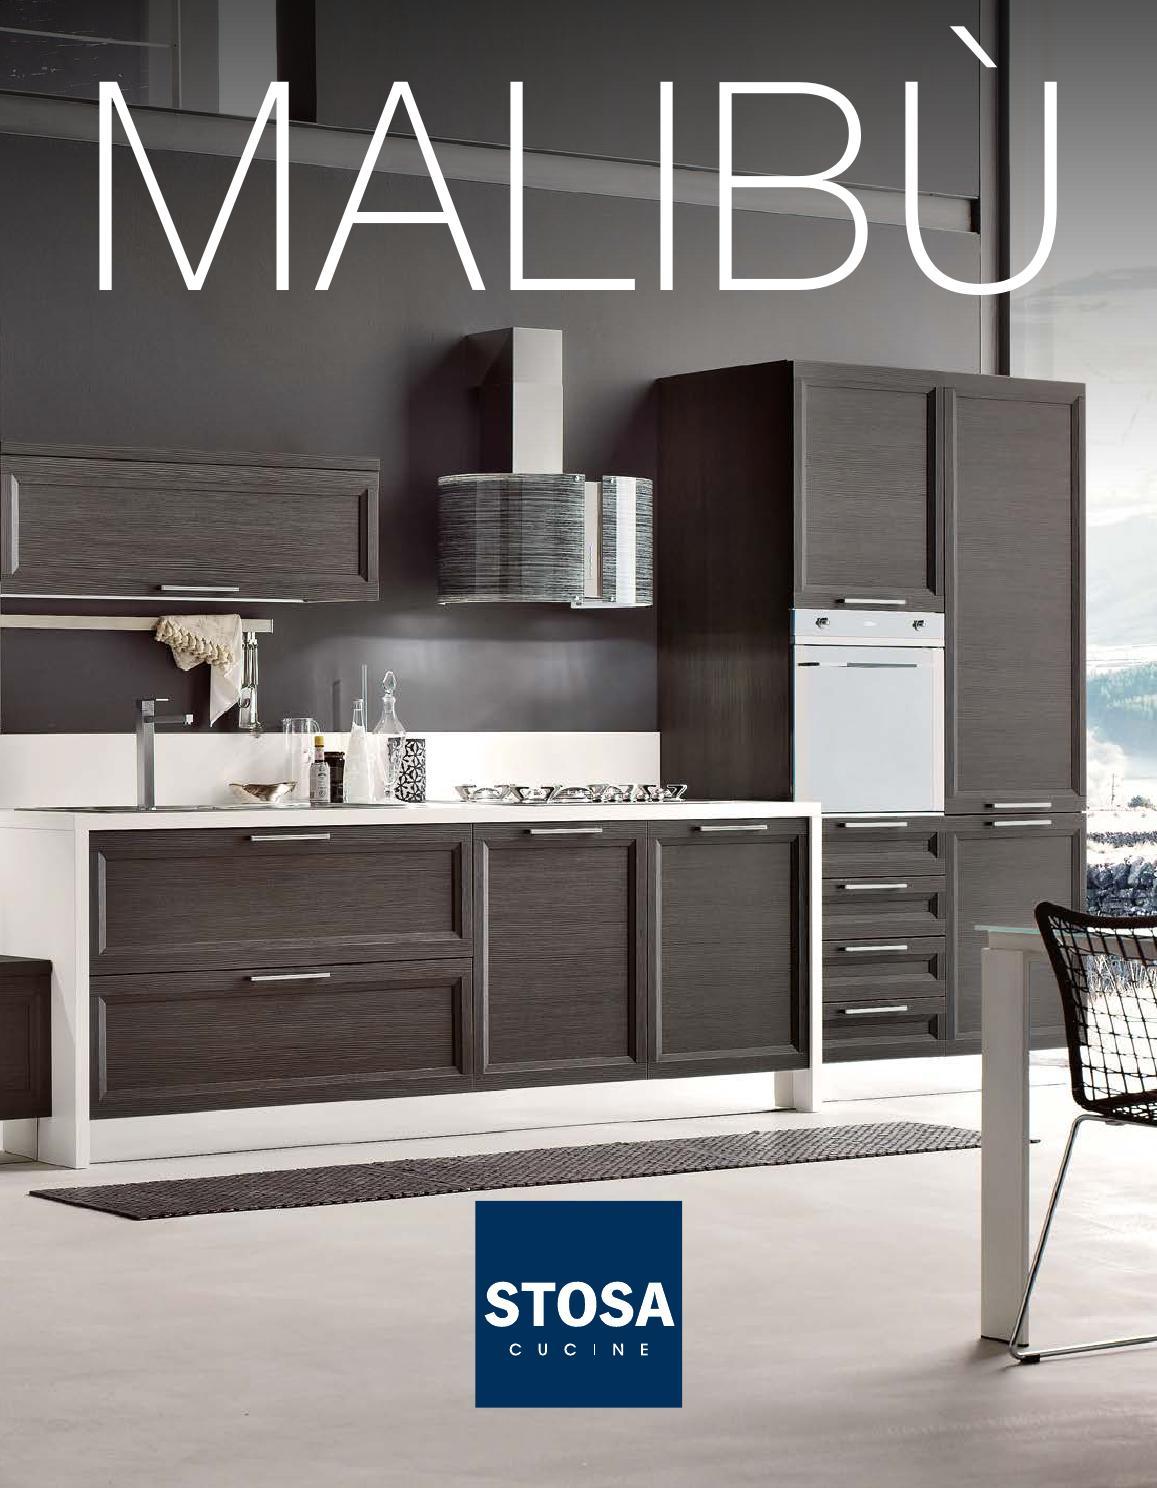 Catalogo cucine stosa moderne malib by stosa cucine issuu for Piani di casa di log di storia singola